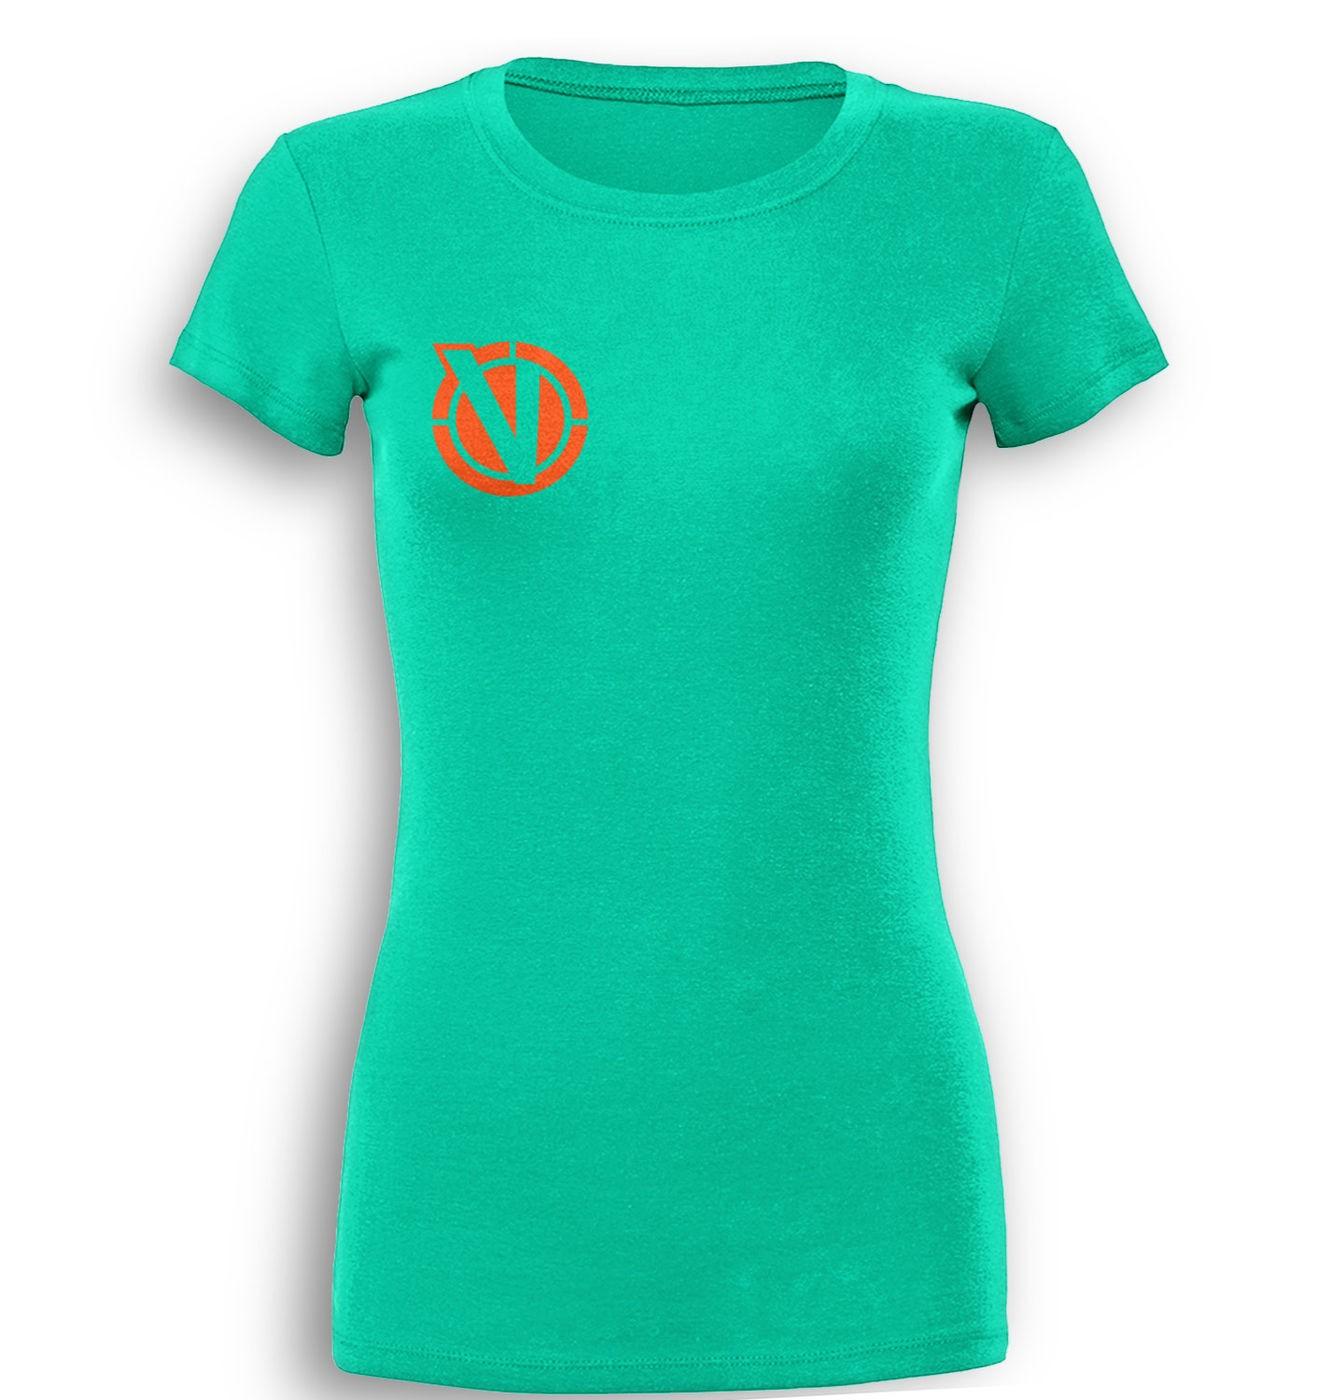 Vindicators Logo premium womens t-shirt by Something Geeky